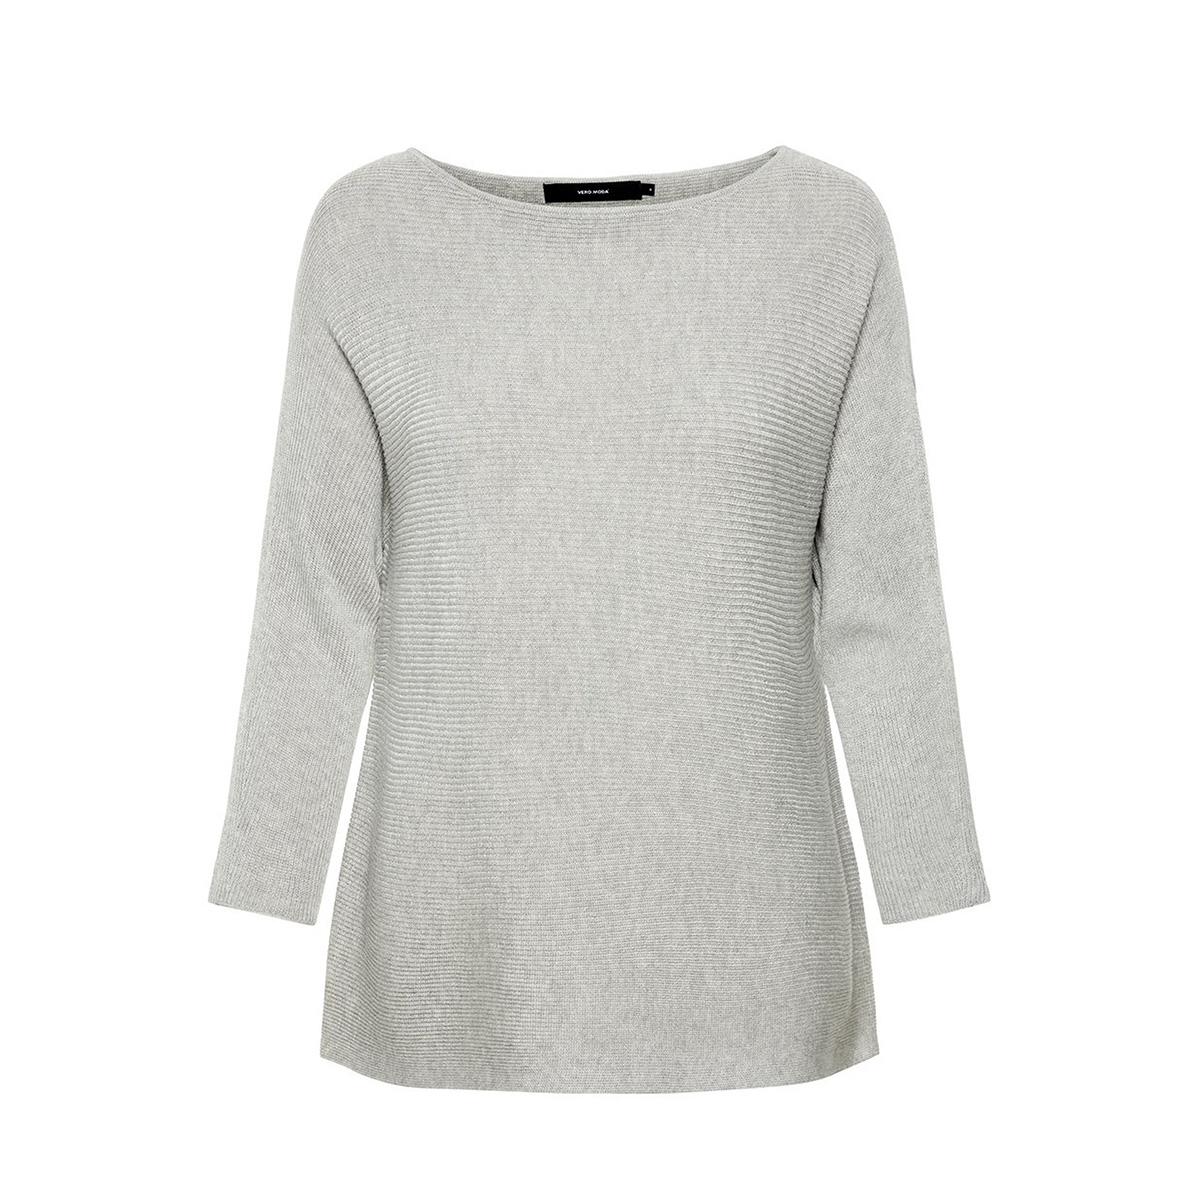 vmnora 3/4 boatneck blouse noos 10210570 vero moda trui light grey melange